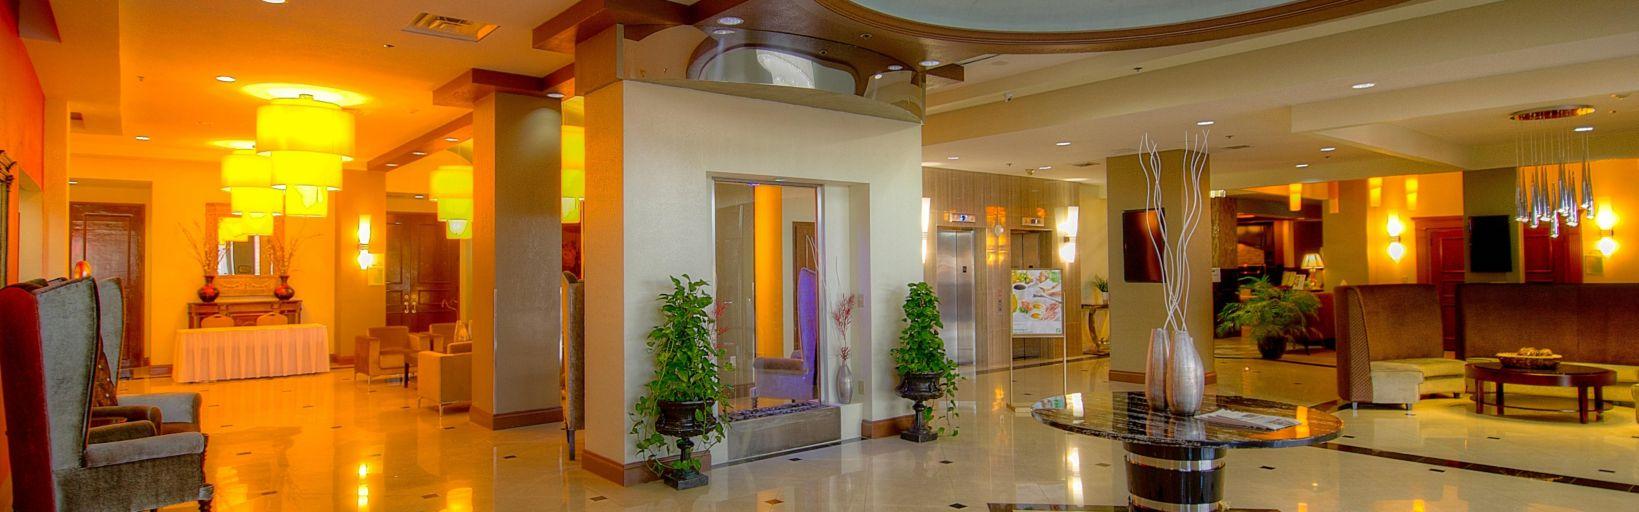 Holiday Inn Orlando East - UCF Area Hotel by IHG